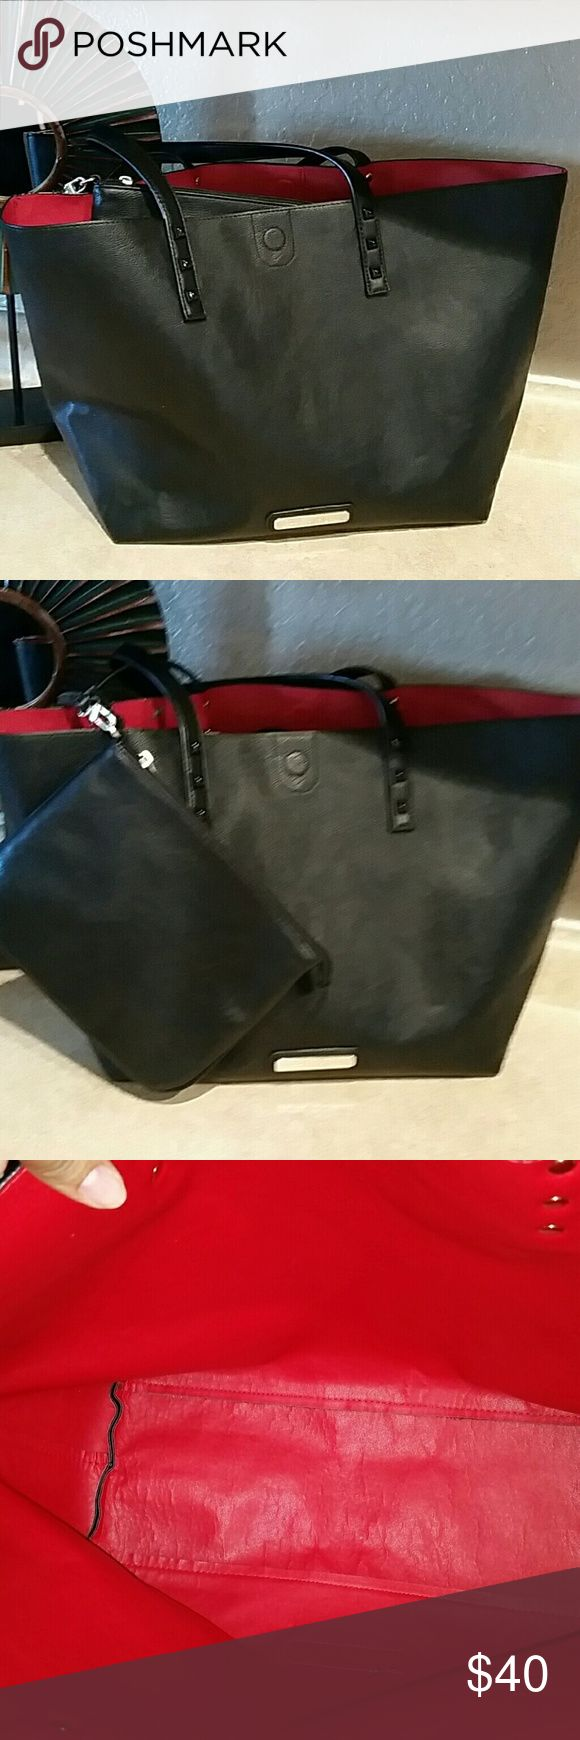 "Olivia + Joy tote bag NWT. Olivia + Joy large black tote bag with bonus black wristlet zip pouch. Has magnetic closure.  12""H 12.5"" bottom W 20.5"" W top of bag 5.5"" D Wristlet is 9""?7"" Olivia + Joy Bags Totes"